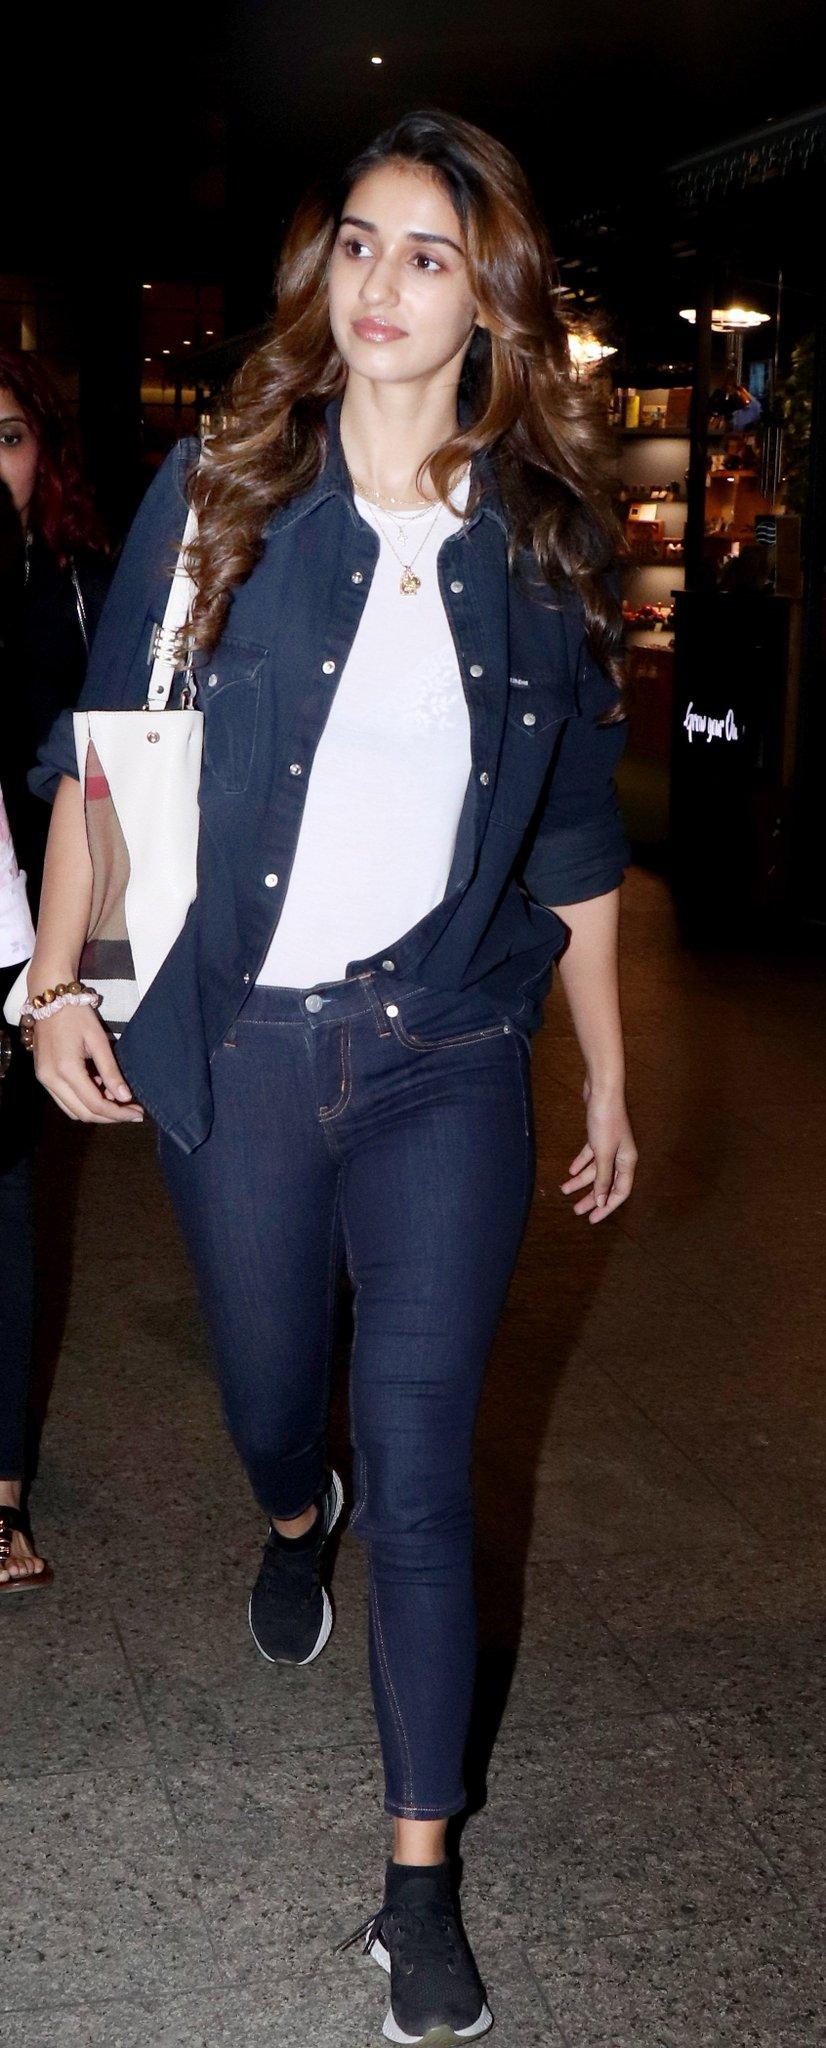 Deepika Padukone and Disha Patani are slaying their airport outfits.  #DeepikaPadukone #DishaPatani #Fashion #CelebStyle #AirportOutfit https://t.co/0R8riGCDTm